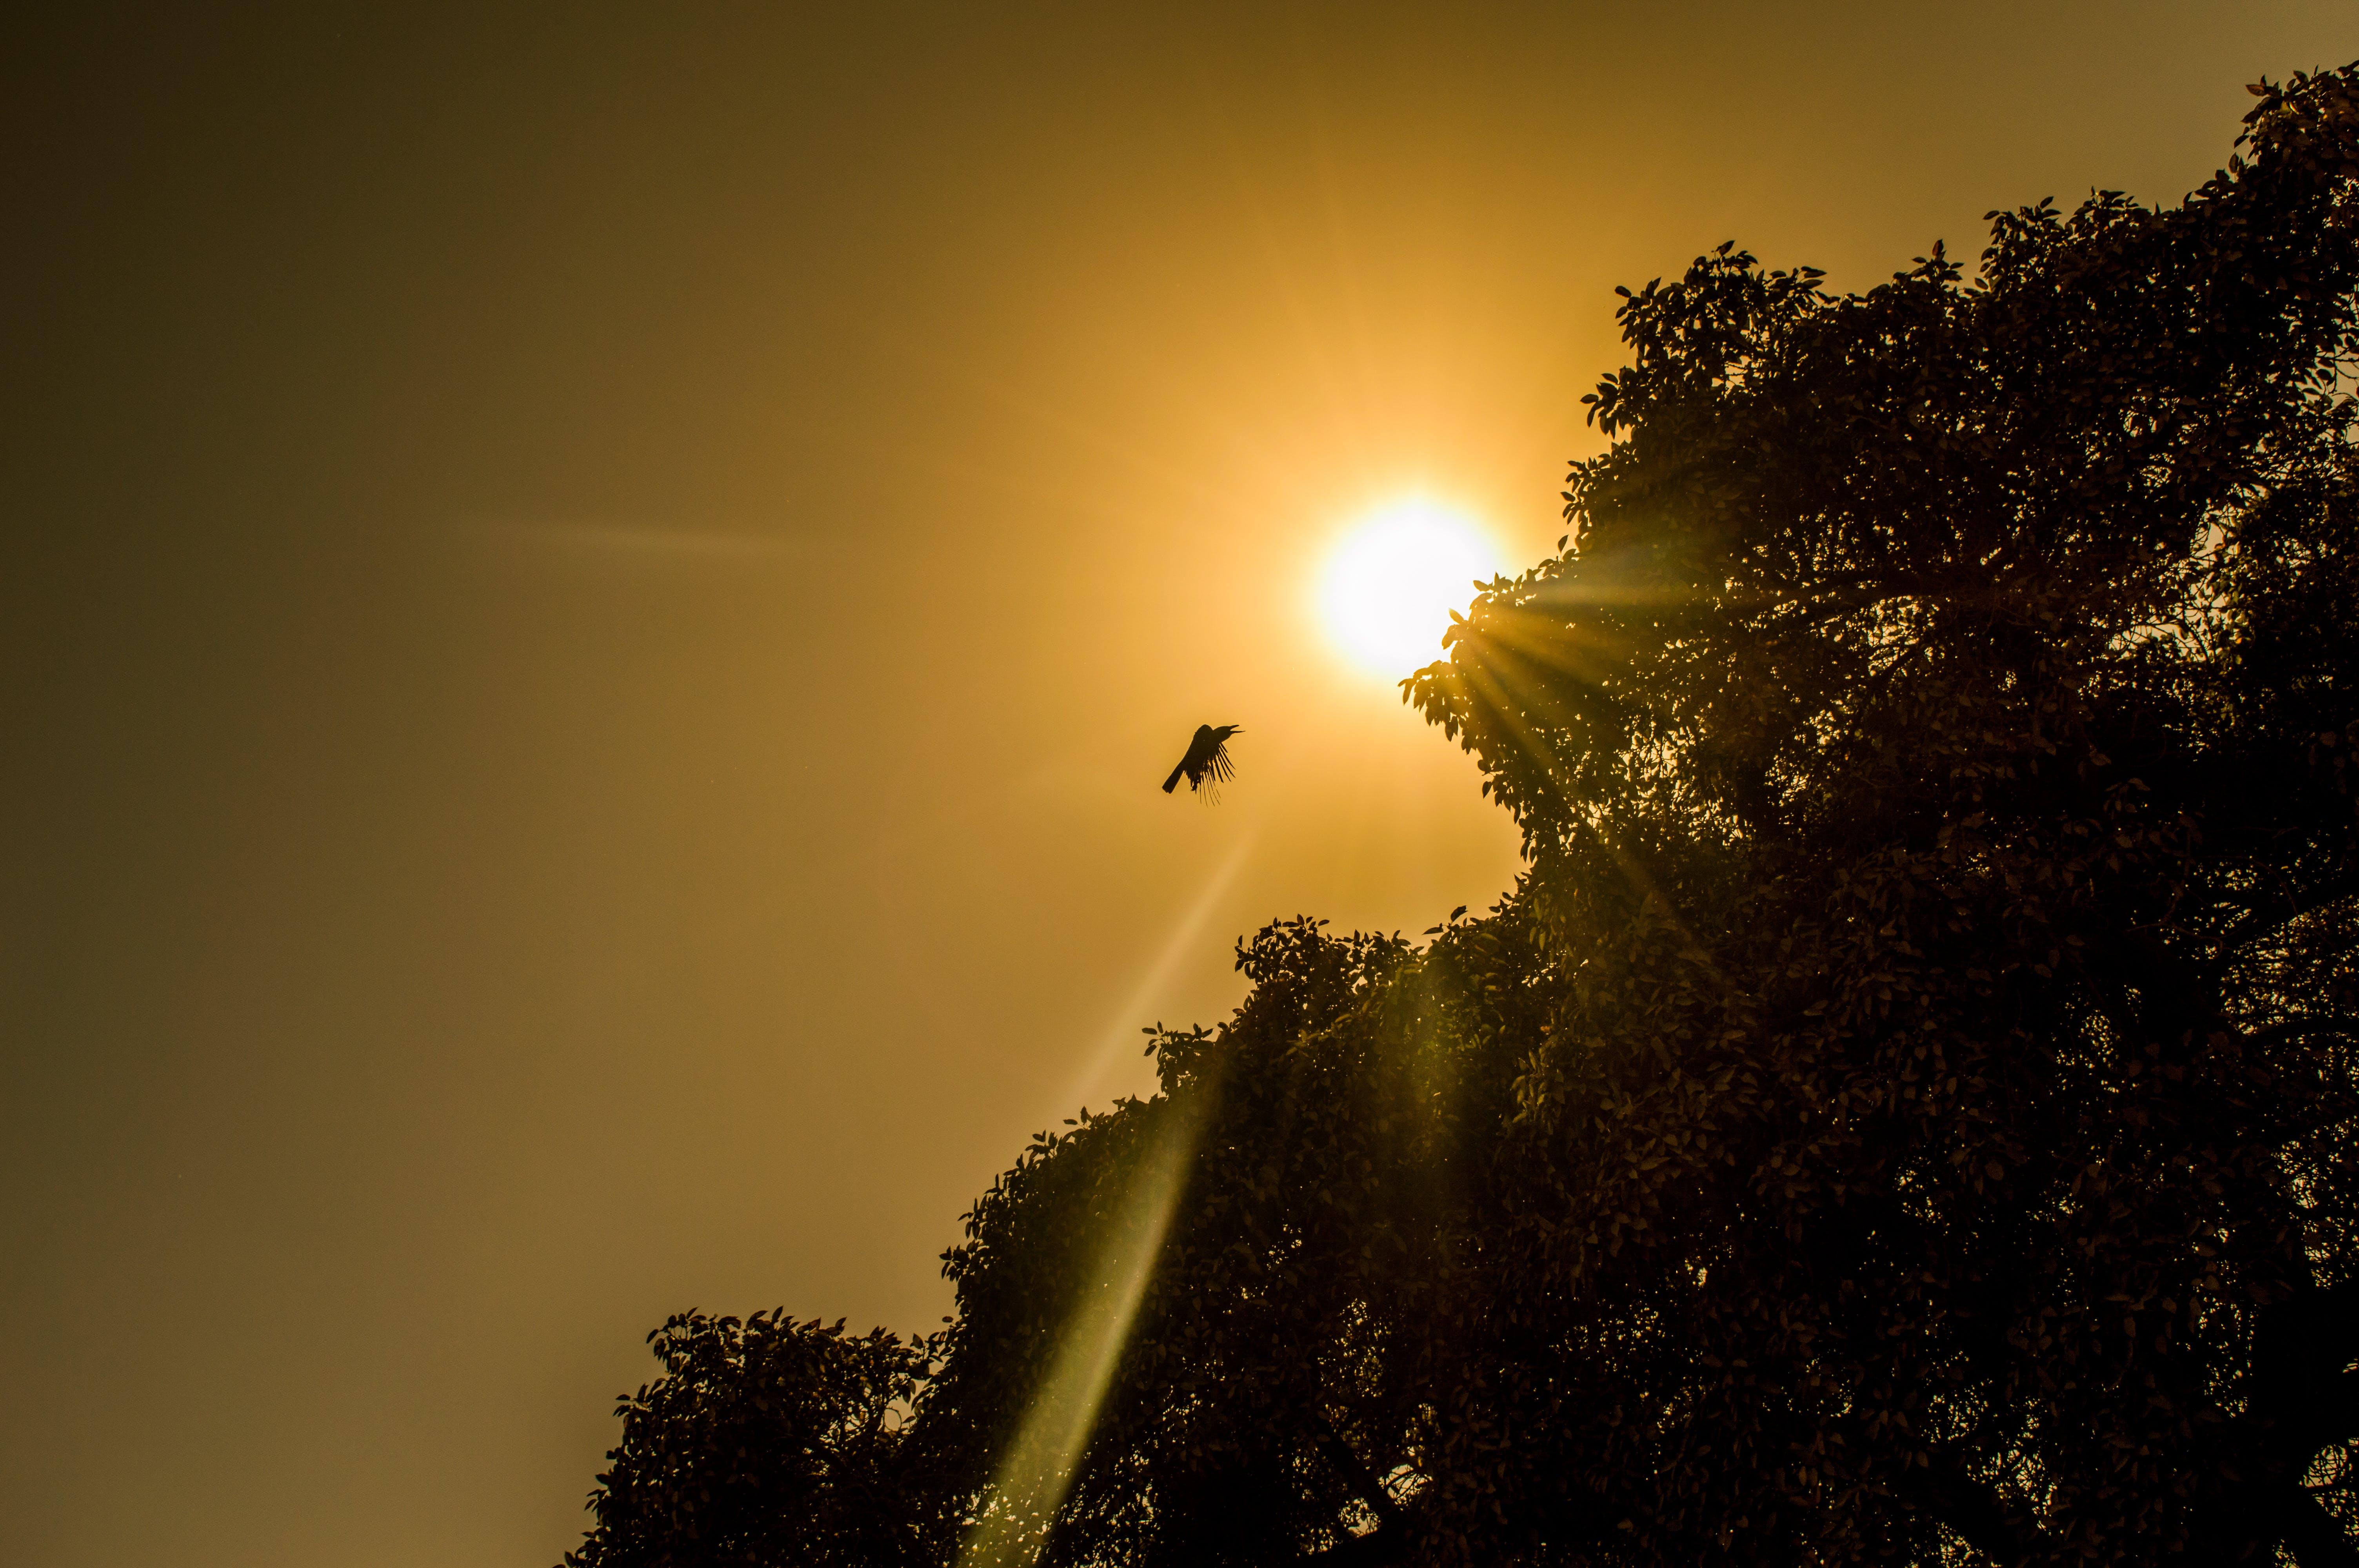 Low Angle Photography of Bird Near Tree